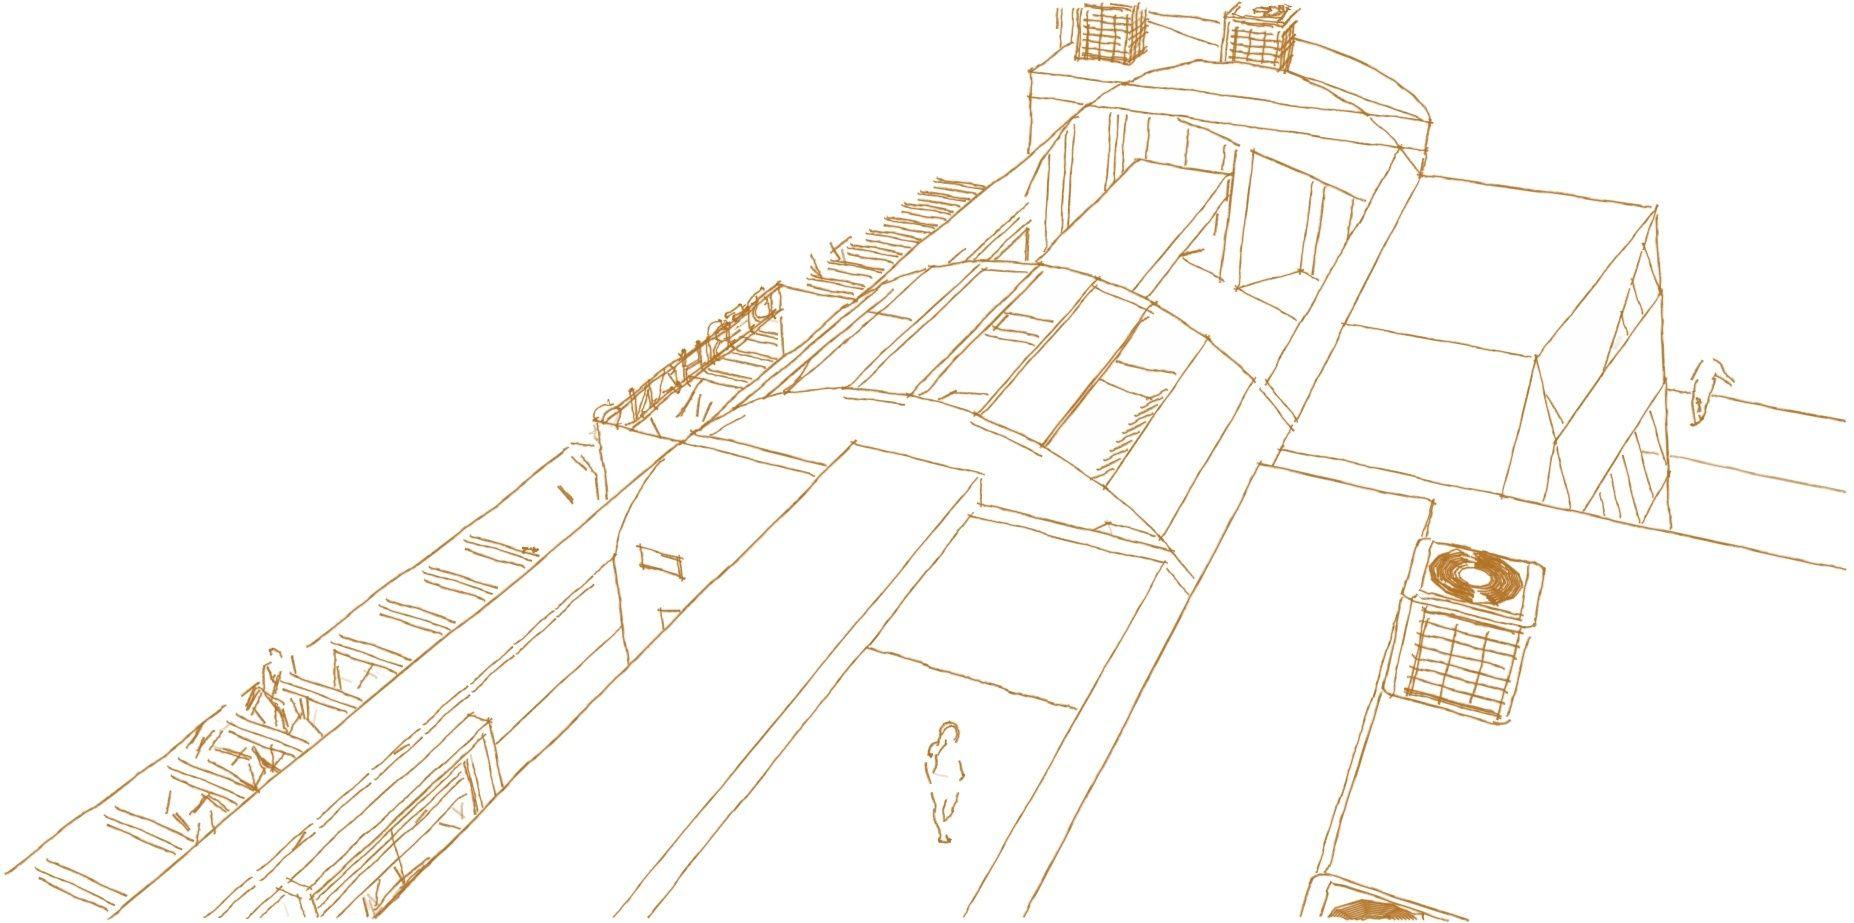 SketchUp'eur architecte -AnthO'- - Page 4 Debian14